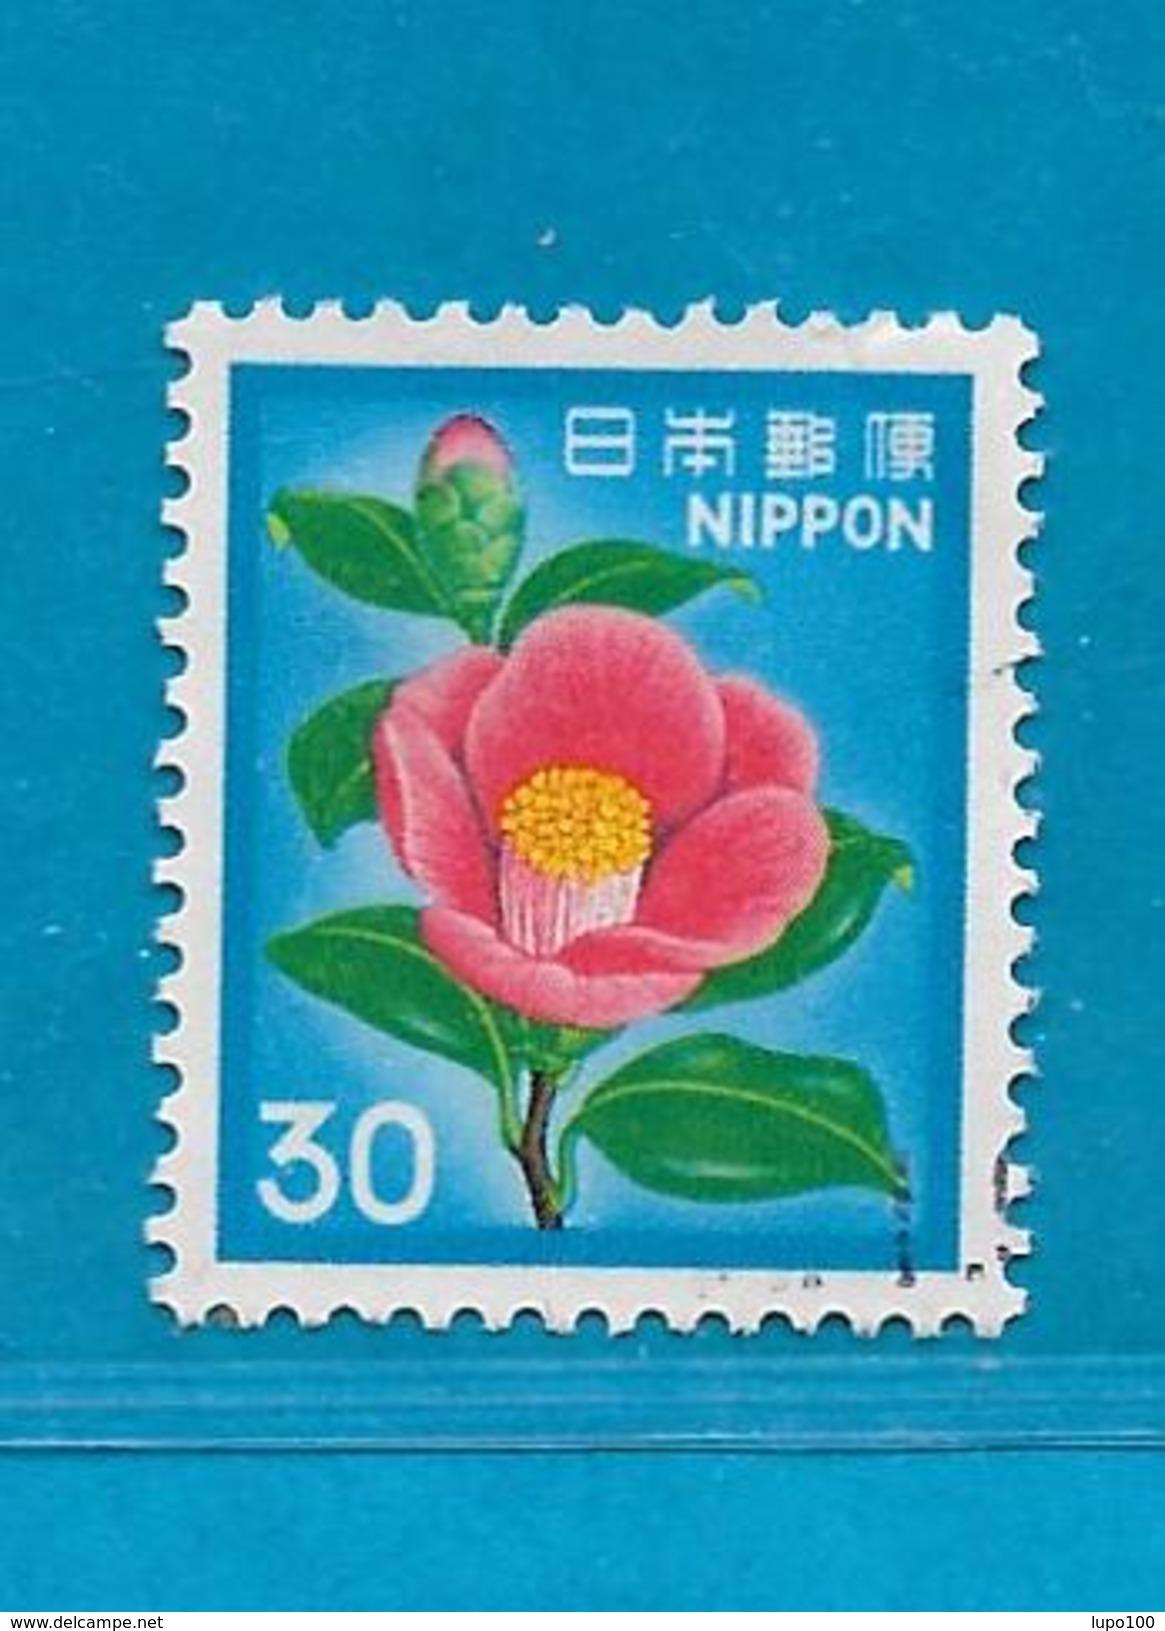 1980 GIAPPONE NIPPON FRANCOBOLLO USATO STAMP USED -  ORDINARIO FLORA FIORI 30 - Used Stamps